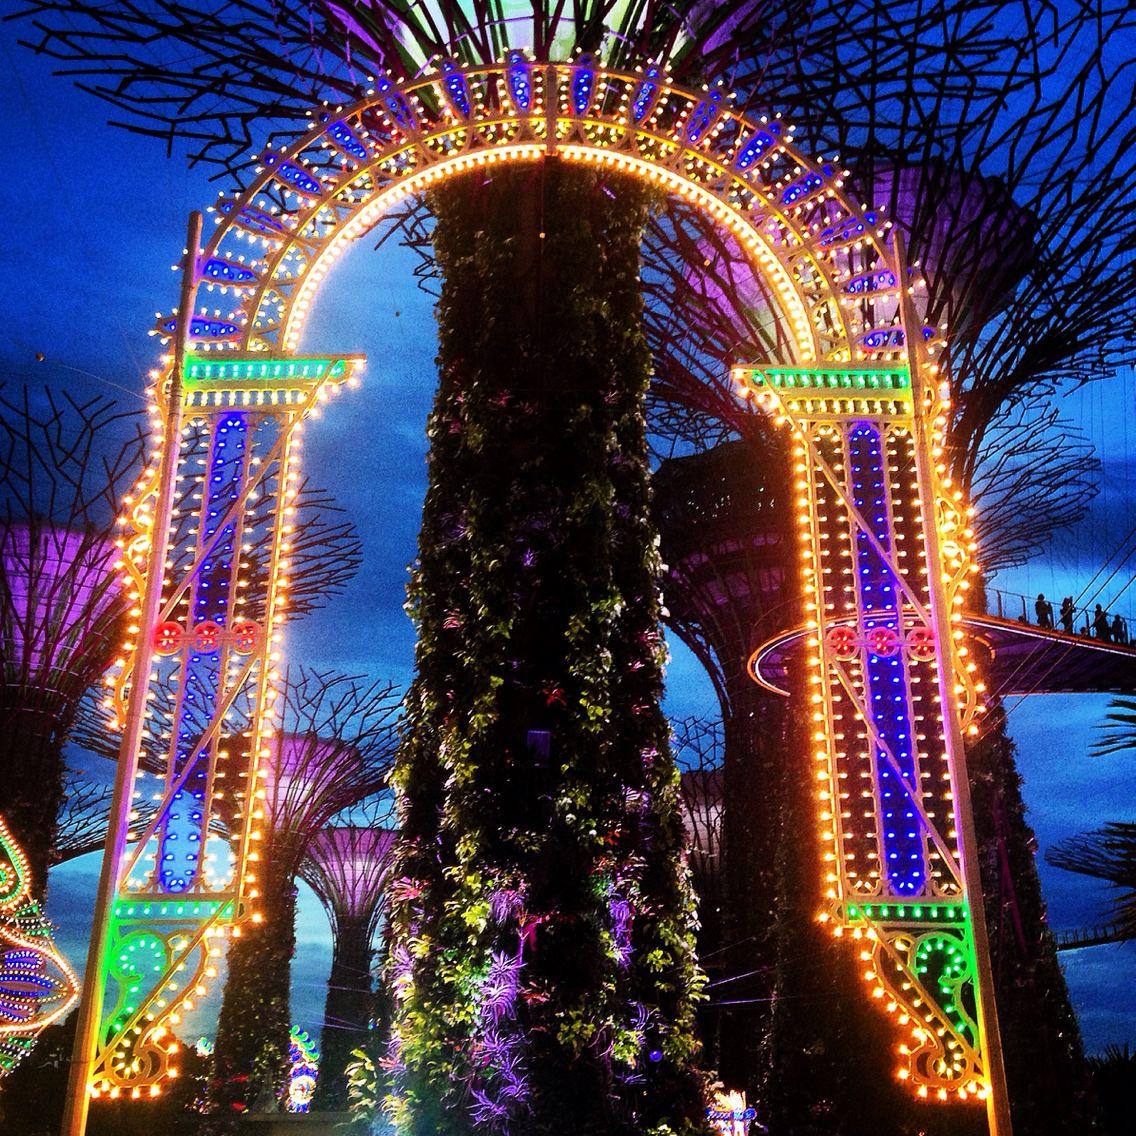 Christmas Wonderland in Singapore 2014 - Gardens by the Bay. | Gardens by the bay, Singapore